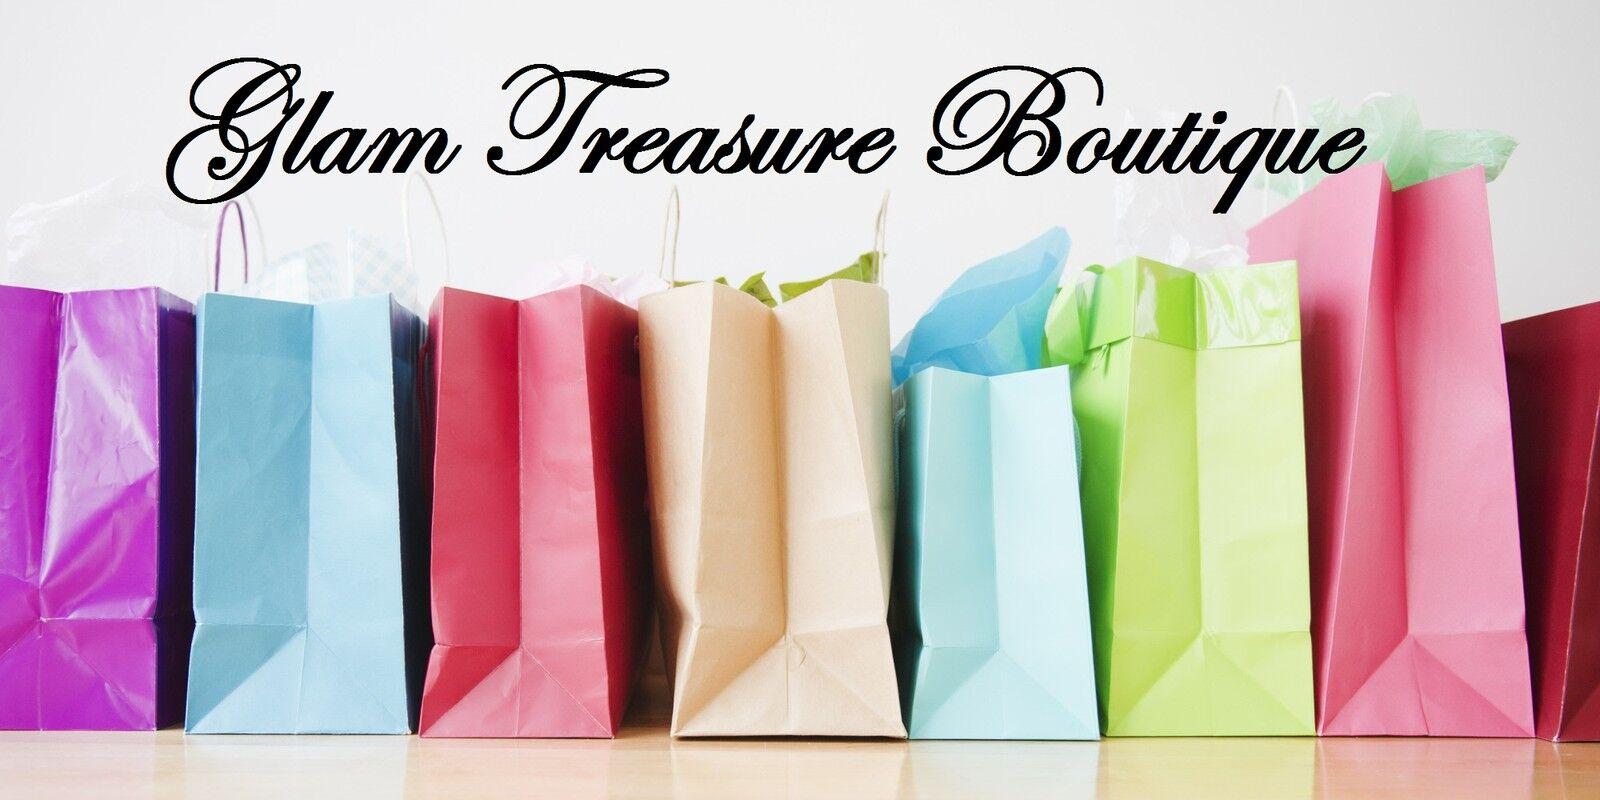 Glam Treasure Boutique